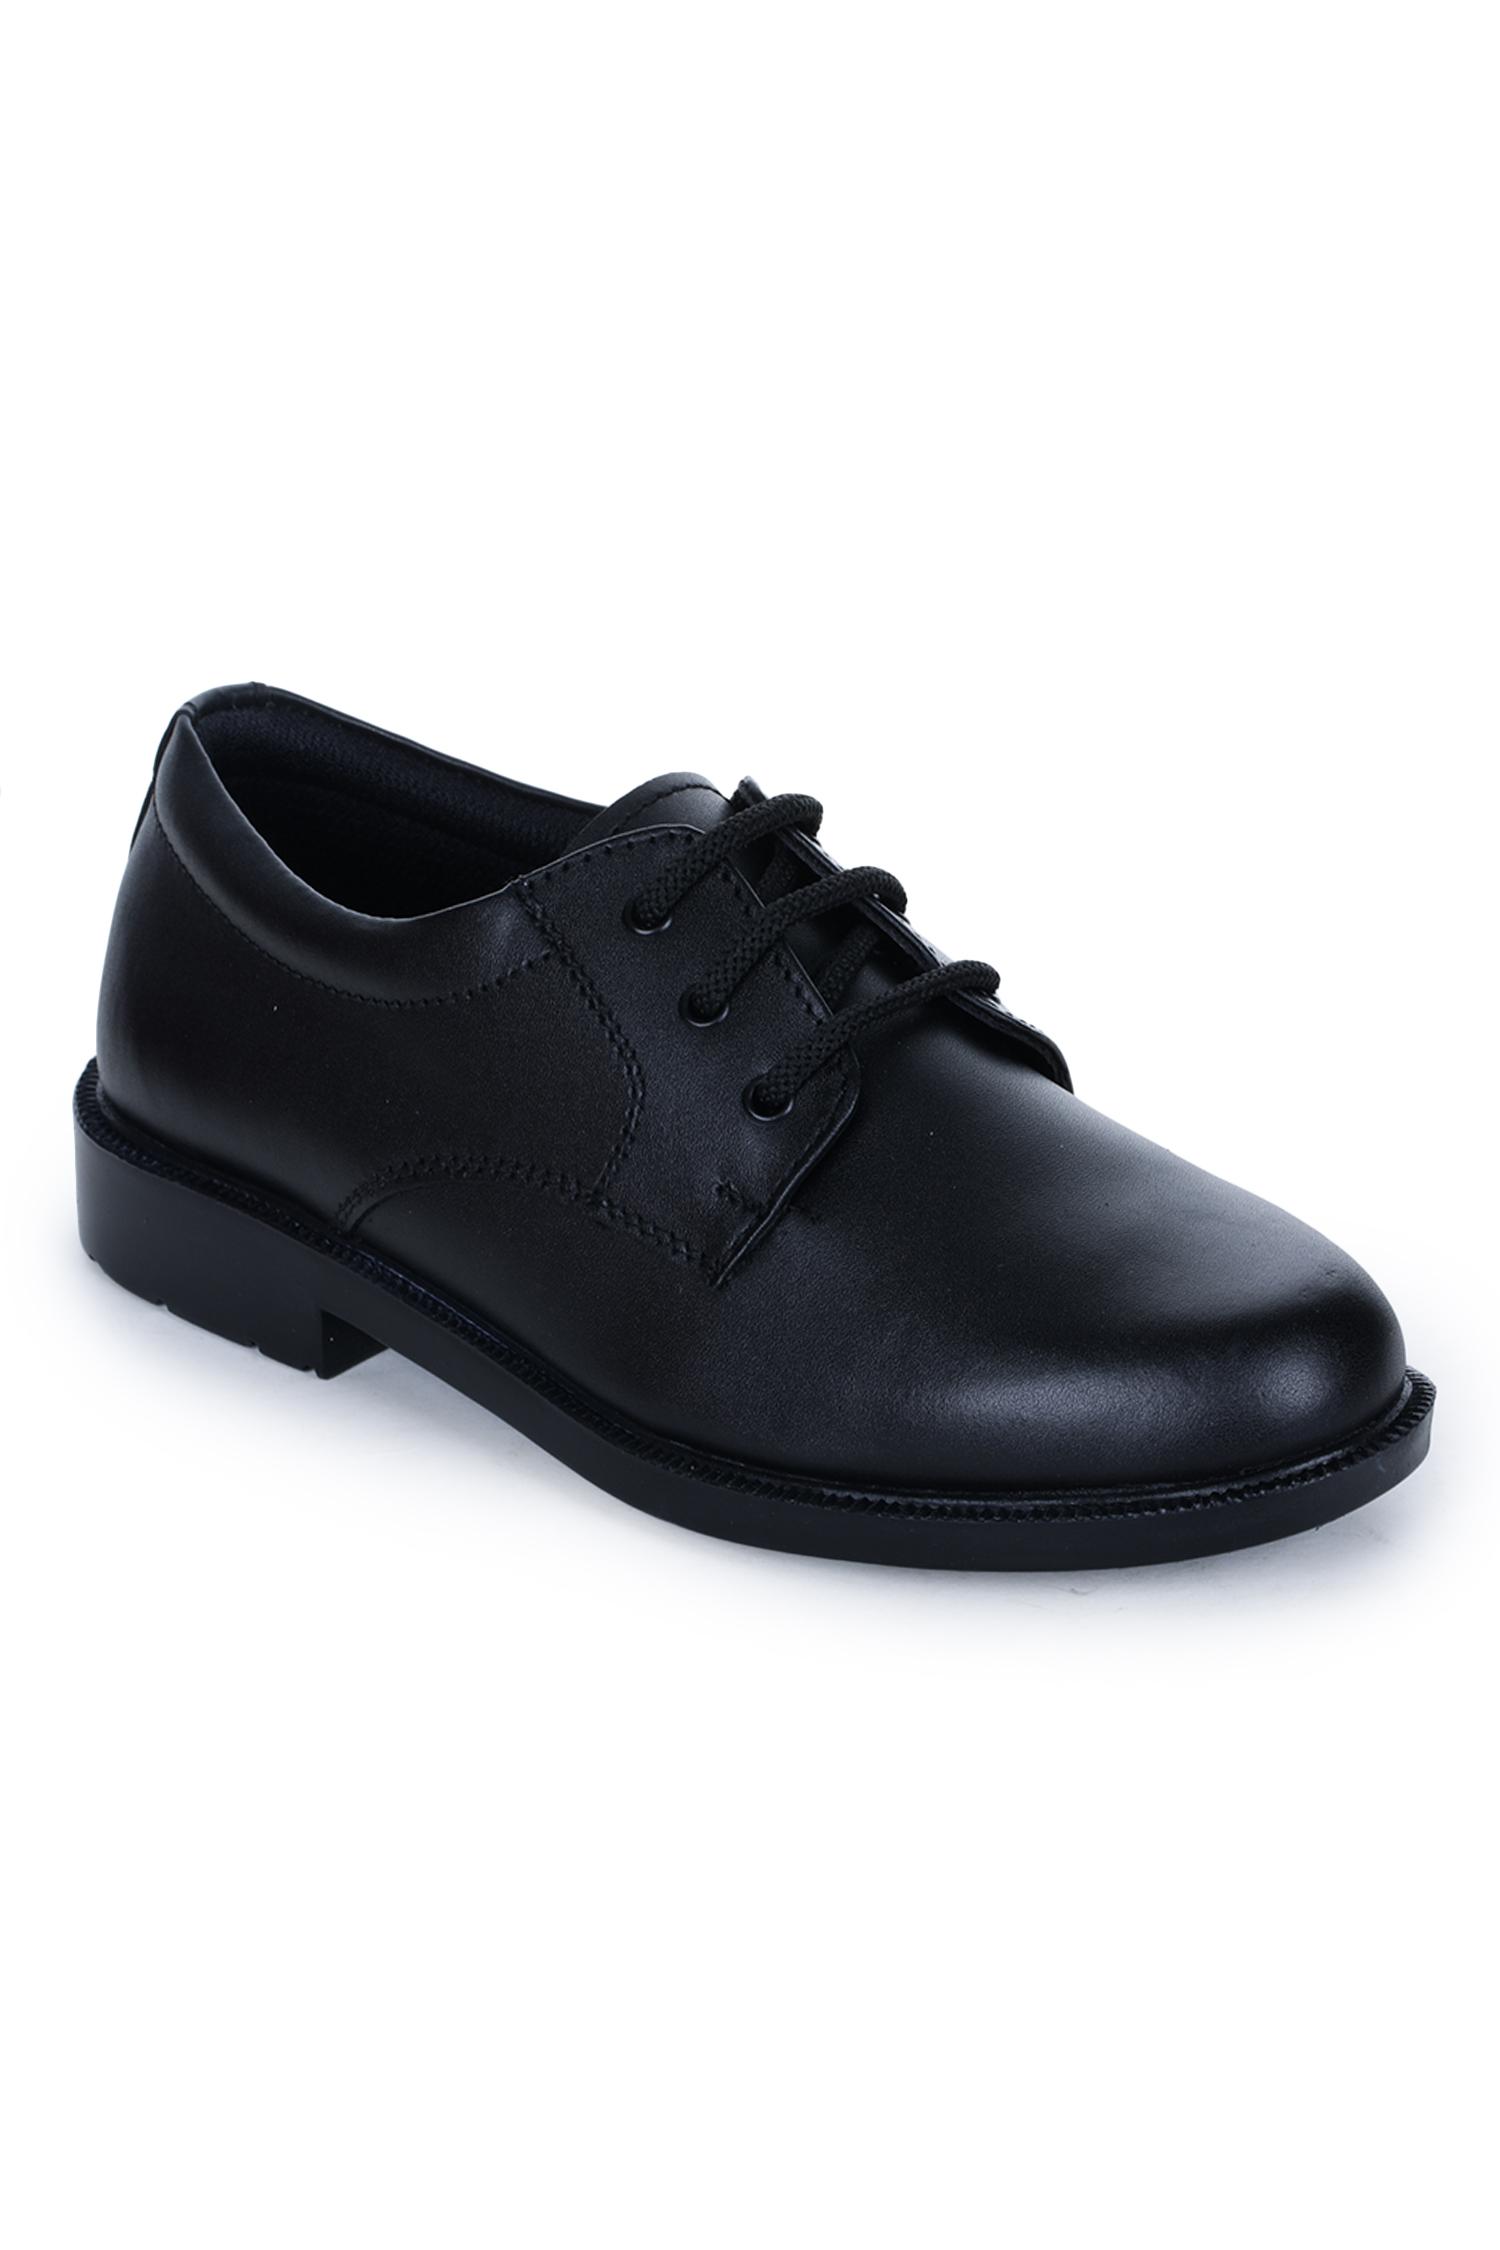 Liberty   Liberty Prefect Black School Shoes S BOY-LS_Black For - Boys